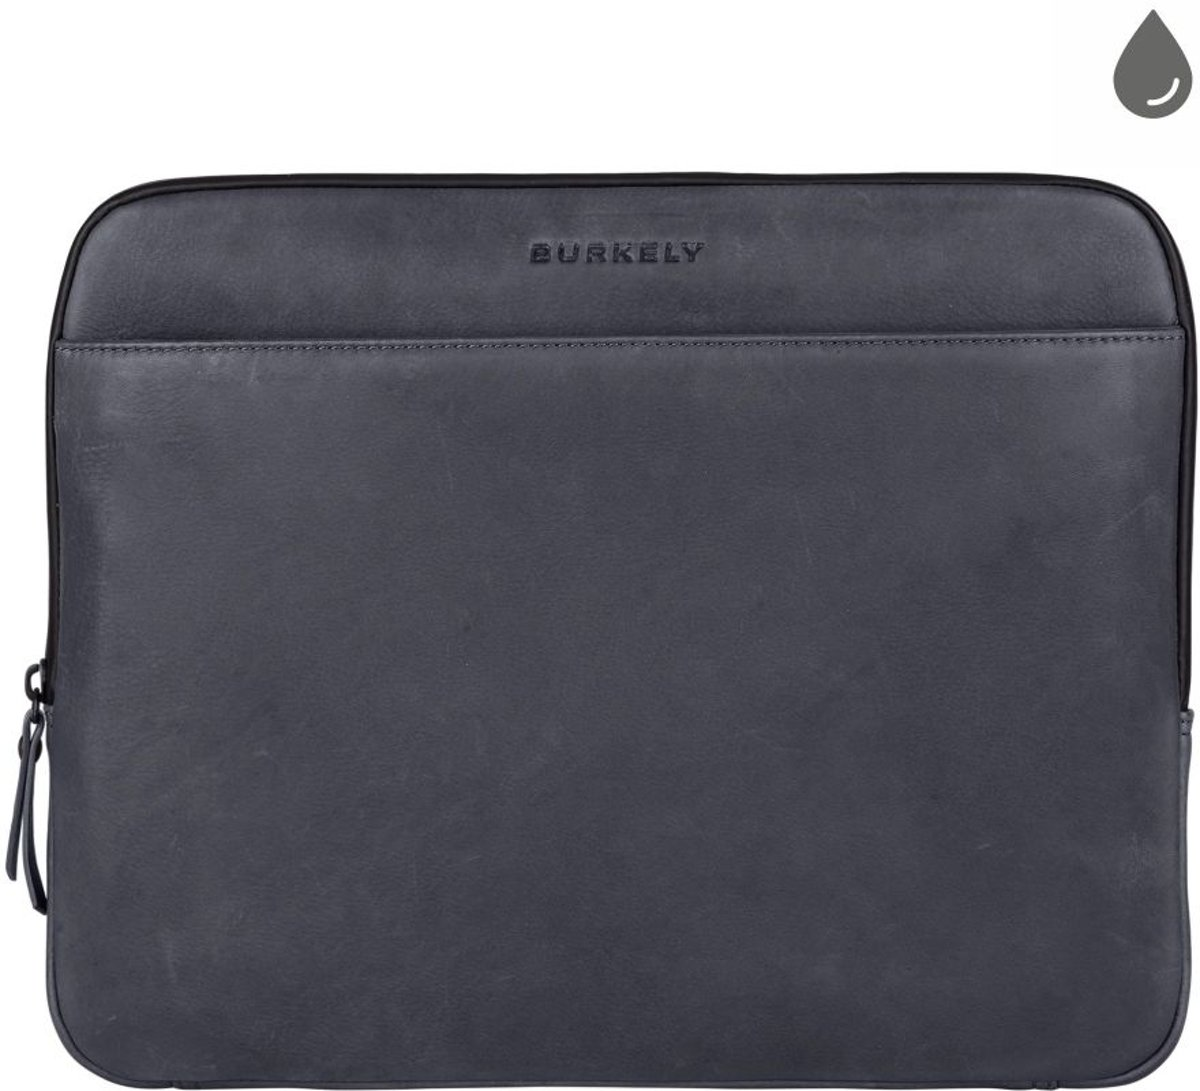 BURKELY Rain Riley Laptopsleeve 13.3 inch Clutch - Storm Blauw kopen